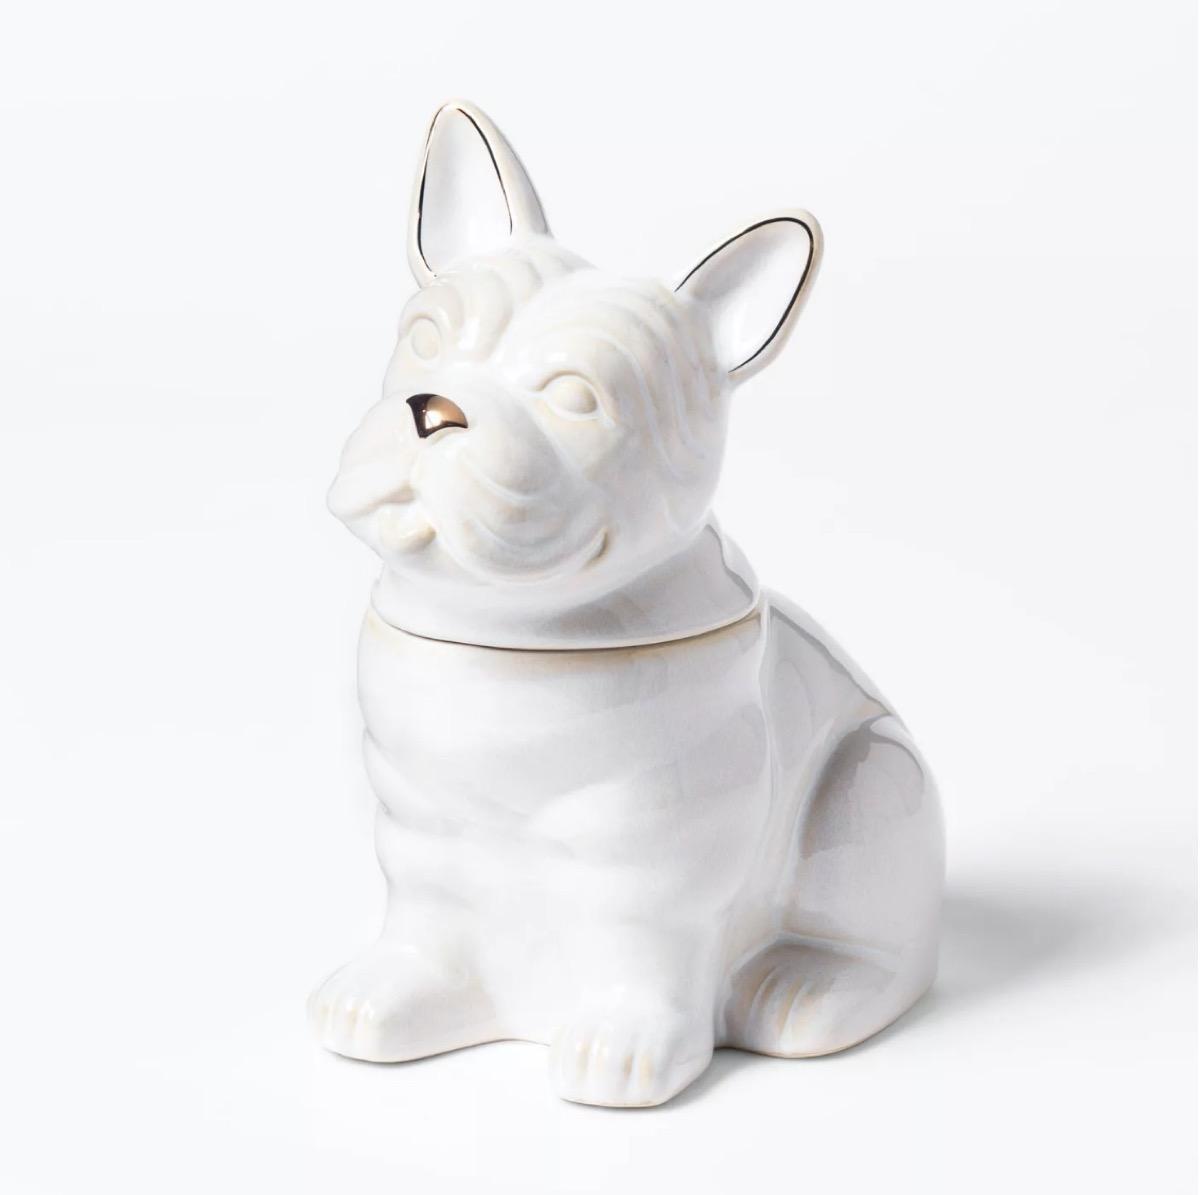 white ceramic cookie jar in the shape of a bulldog